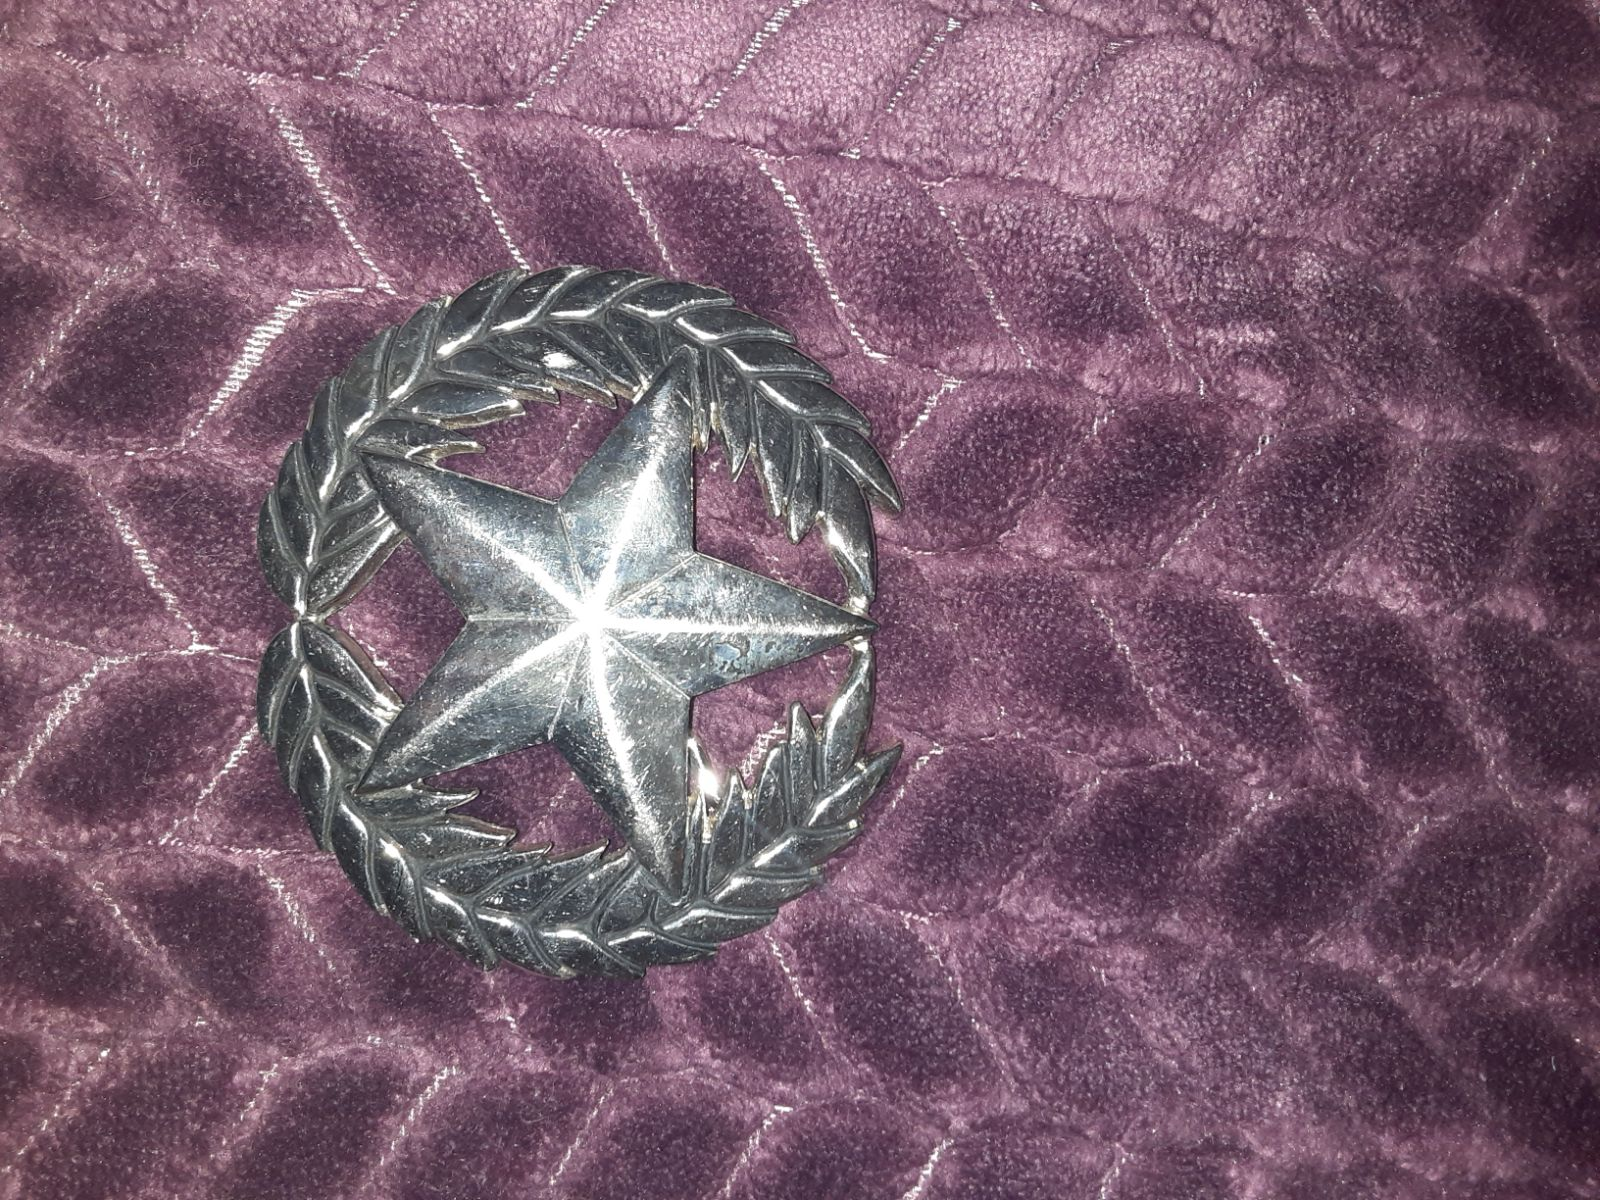 Silver star belt buckles